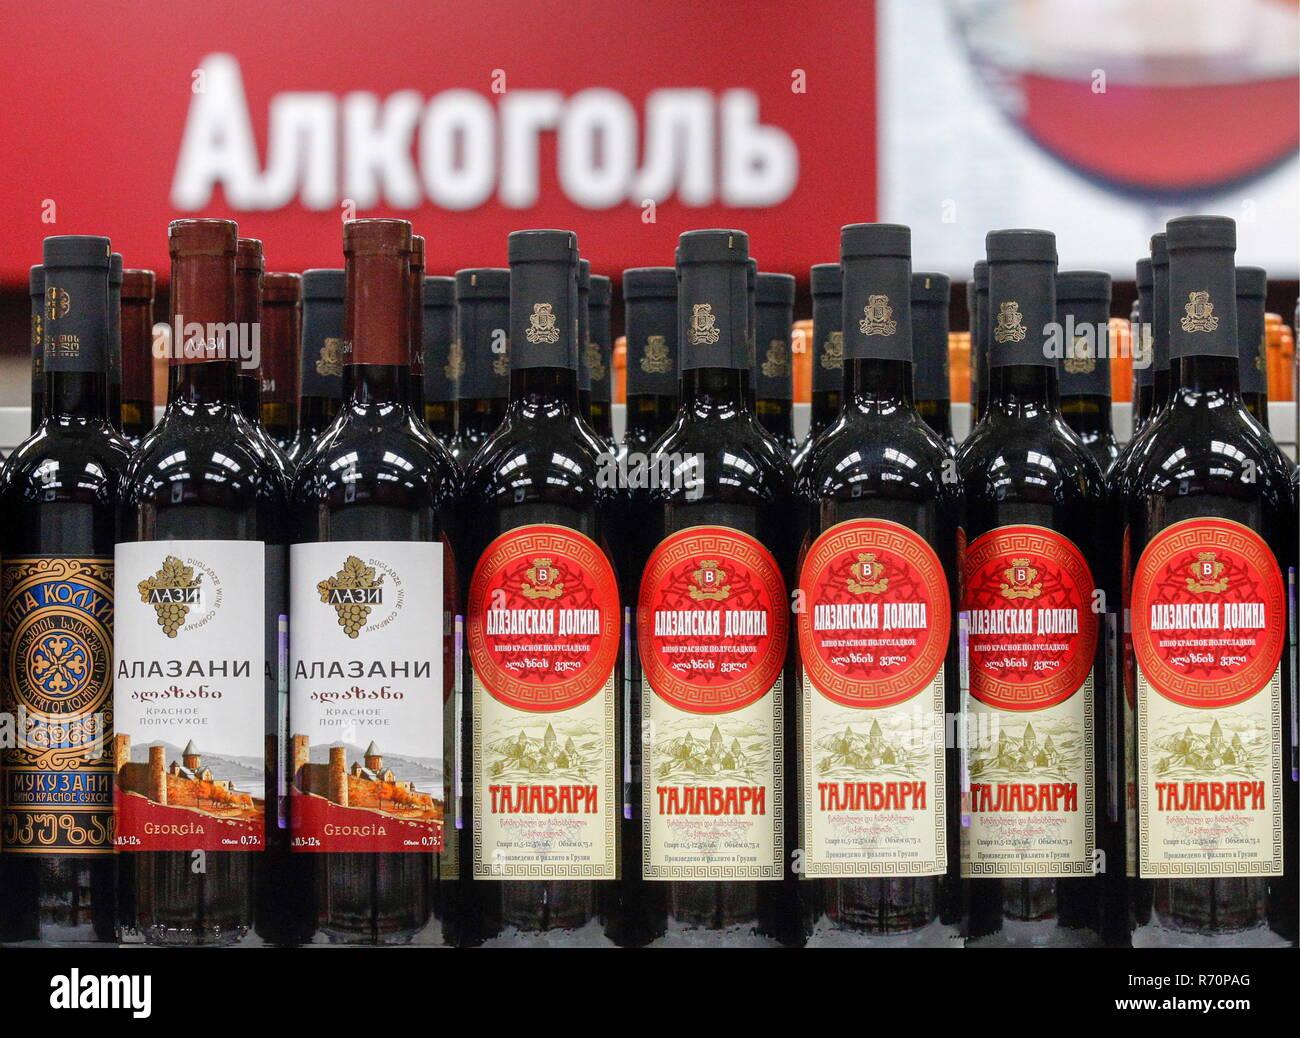 Selling wine at a Lenta supermarket. Valery Matytsin/TASS Credit: ITAR-TASS News Agency/Alamy Live News - Stock Image